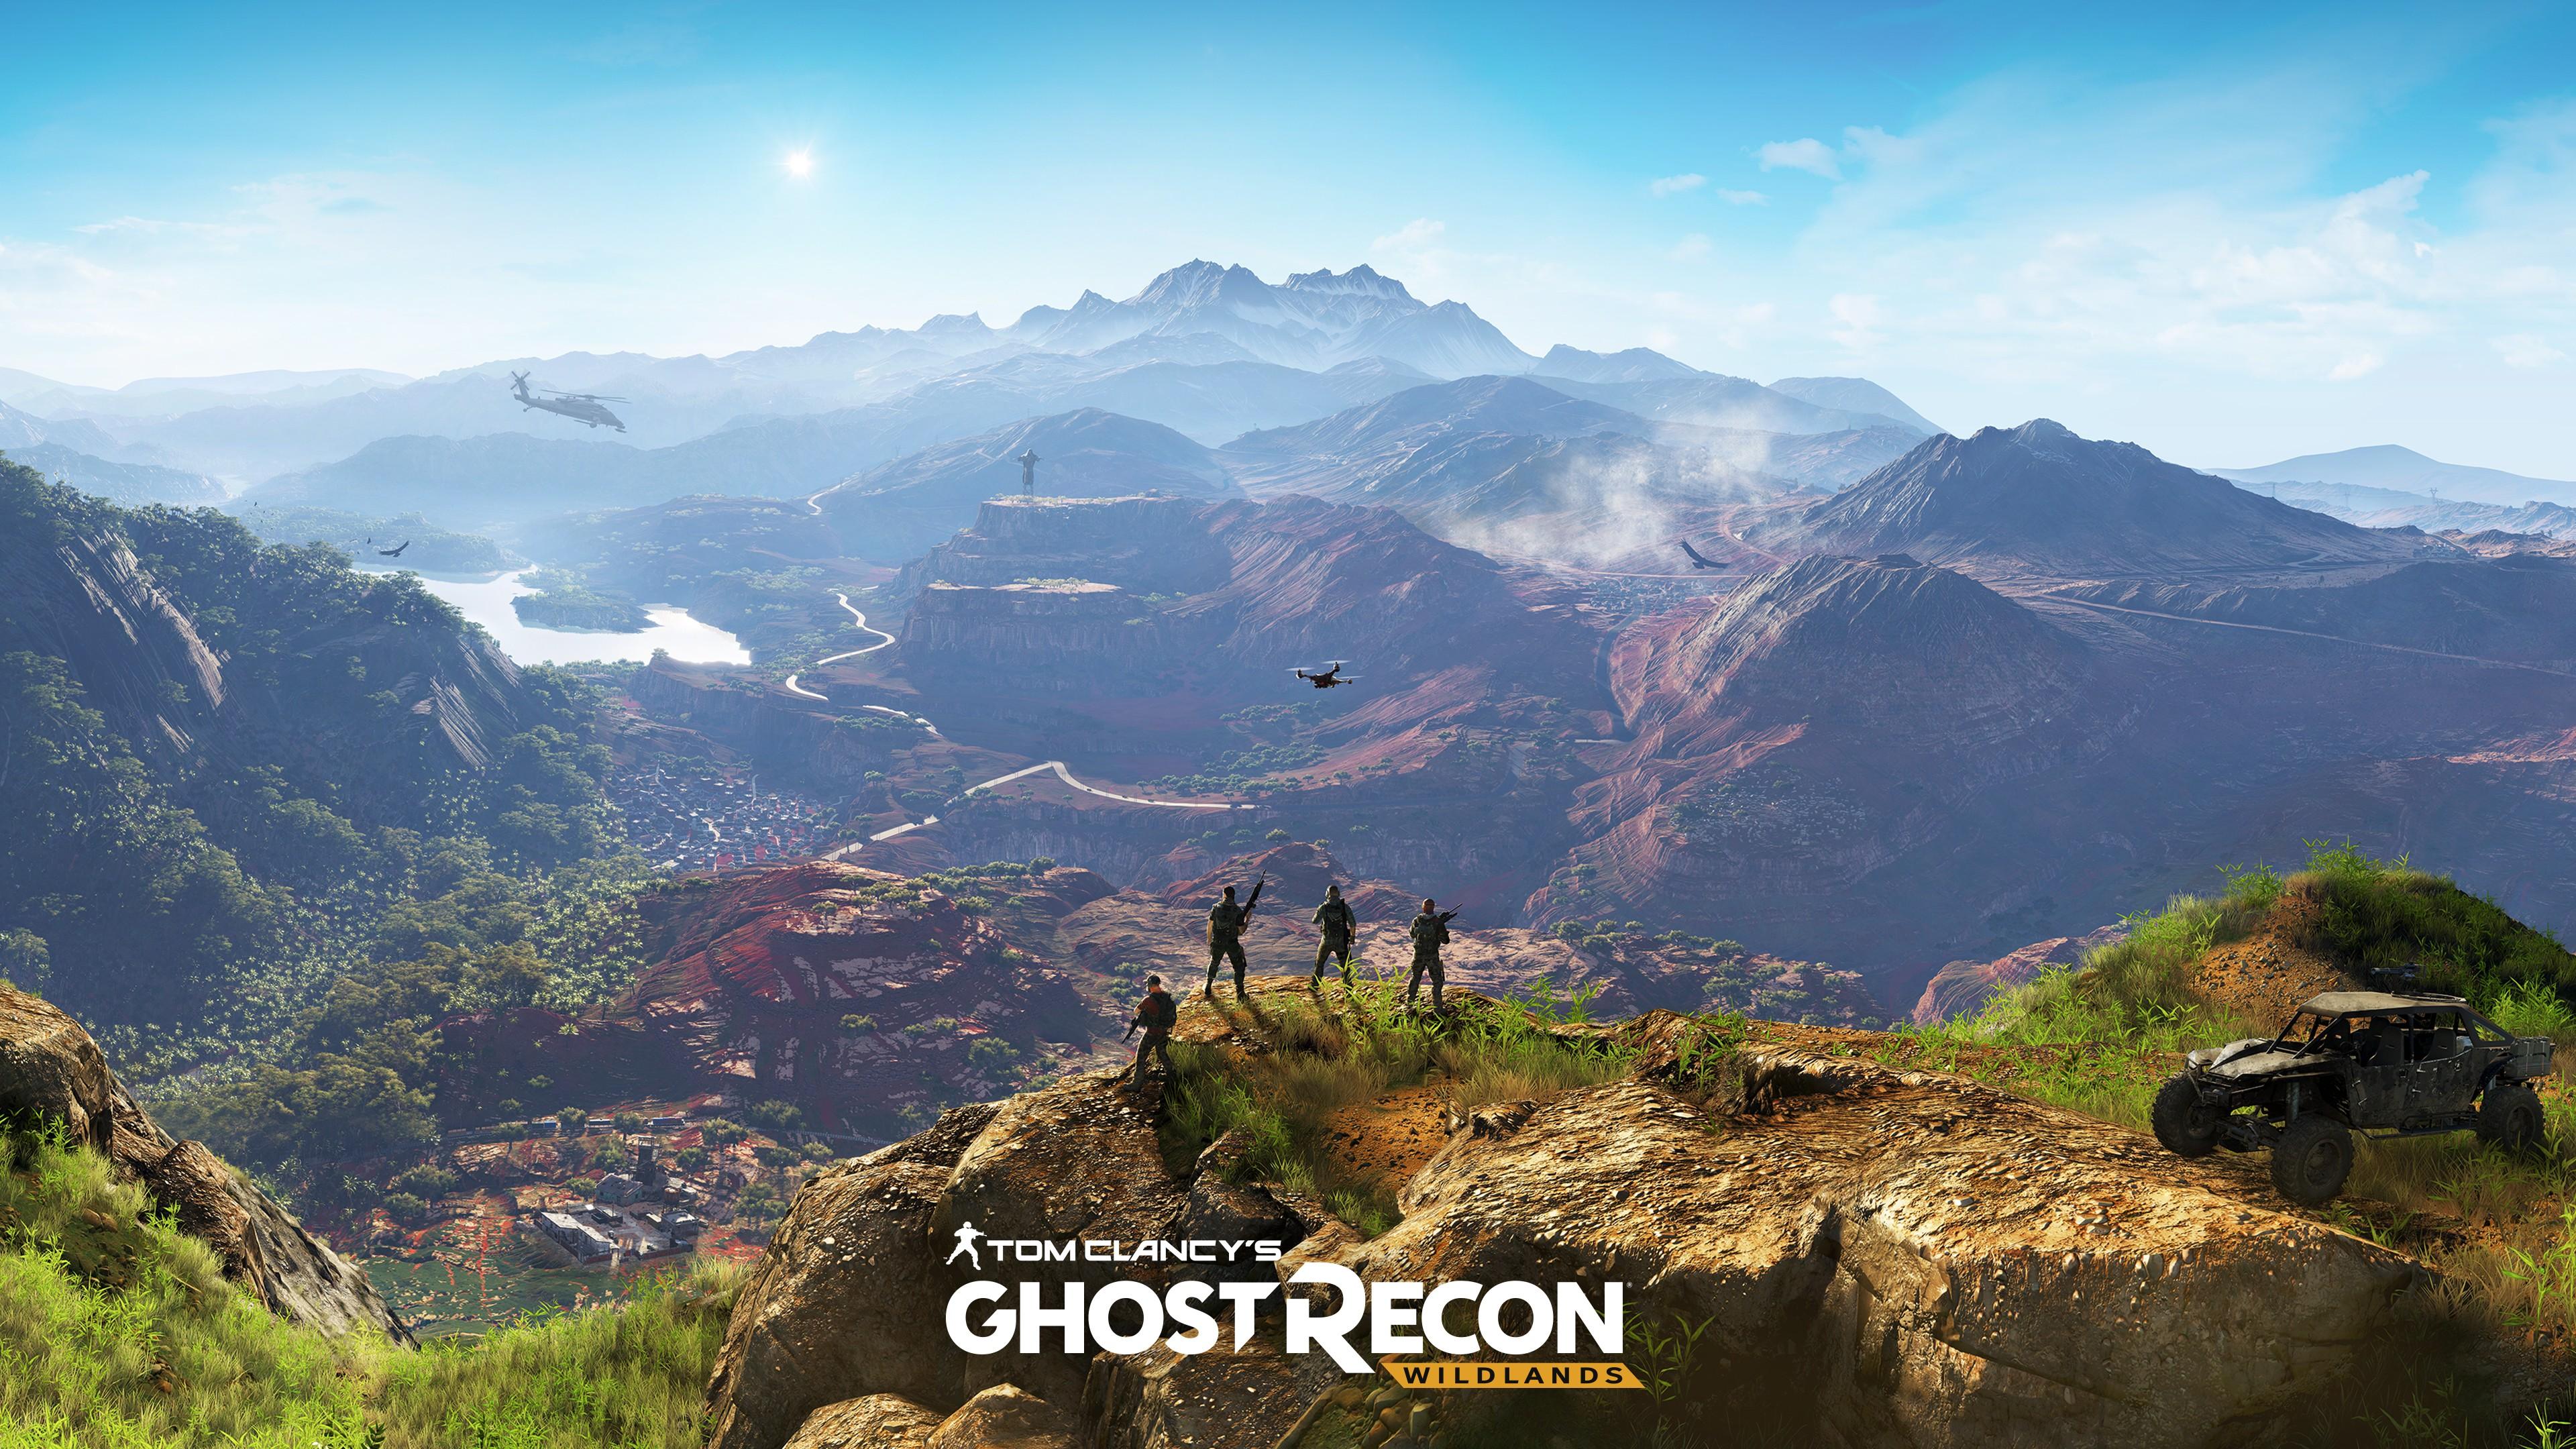 General 3840x2160 Ubisoft PC gaming Tom Clancy's Ghost Recon Tom Clancy's Ghost Recon Tom Clancy's Ghost Recon: Wildlands